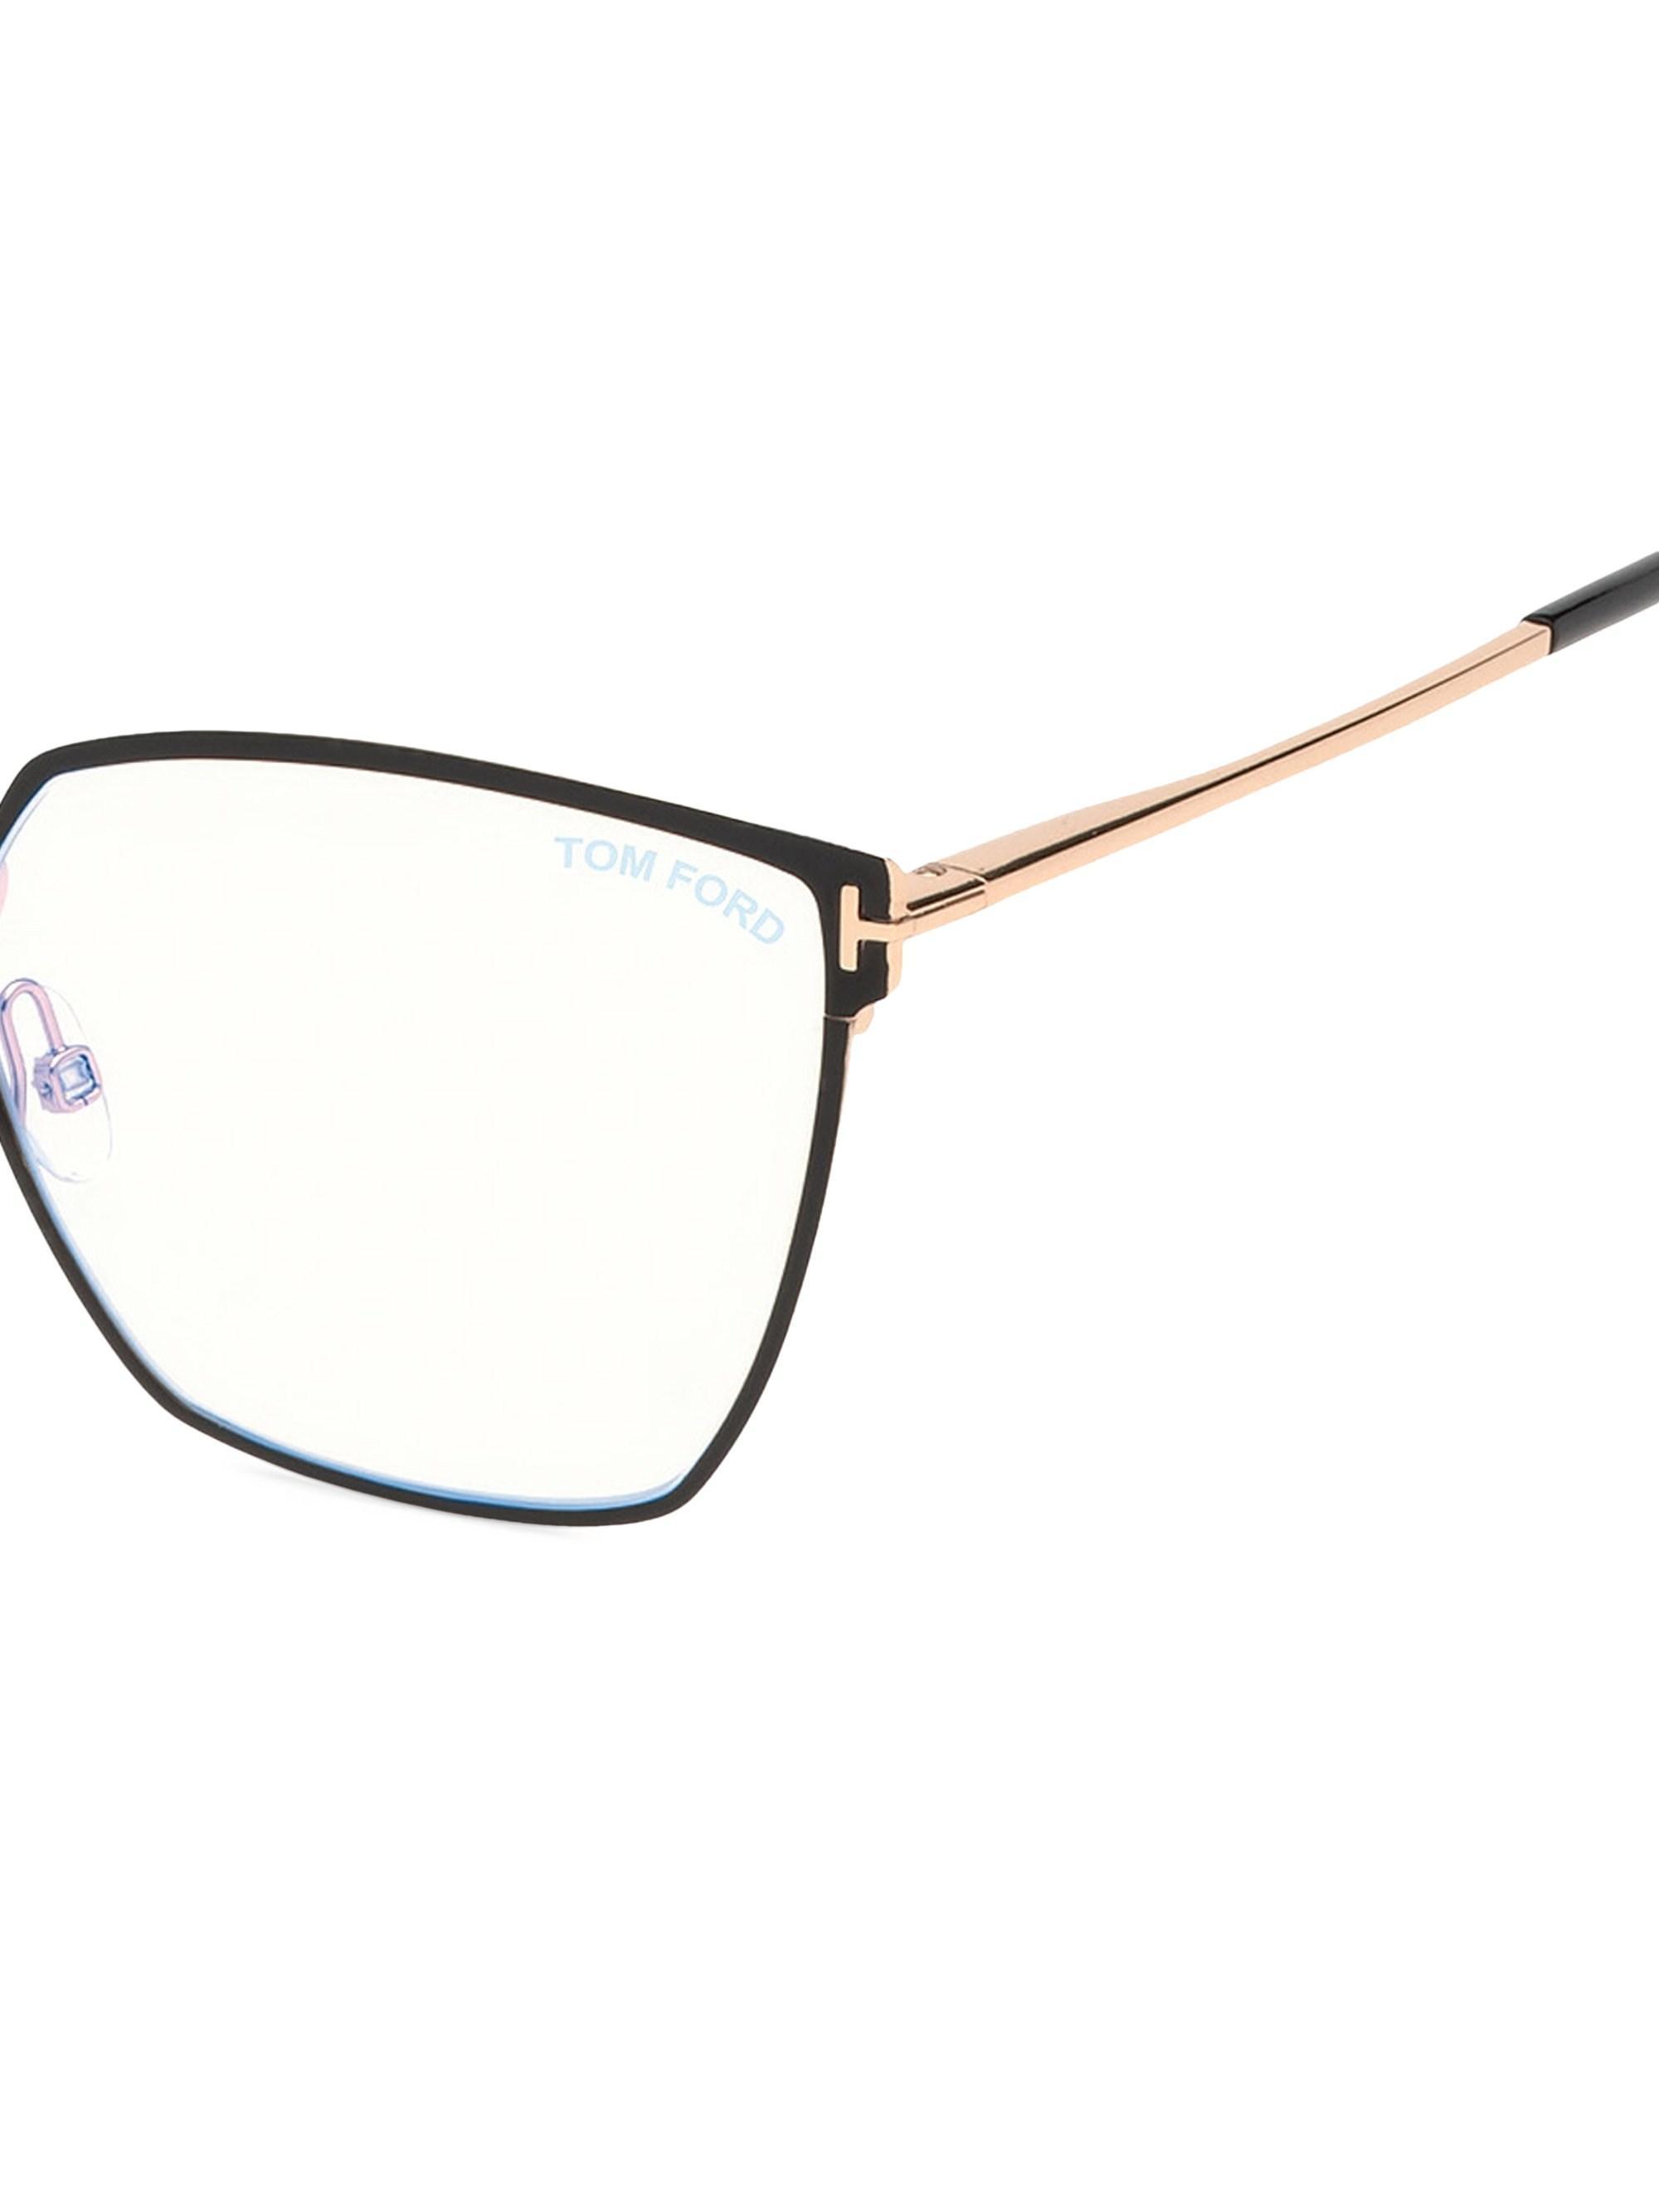 6926eeae34 Lyst - Tom Ford Women s 56mm Angular Metal Blue Block Glasses - Black in  Black